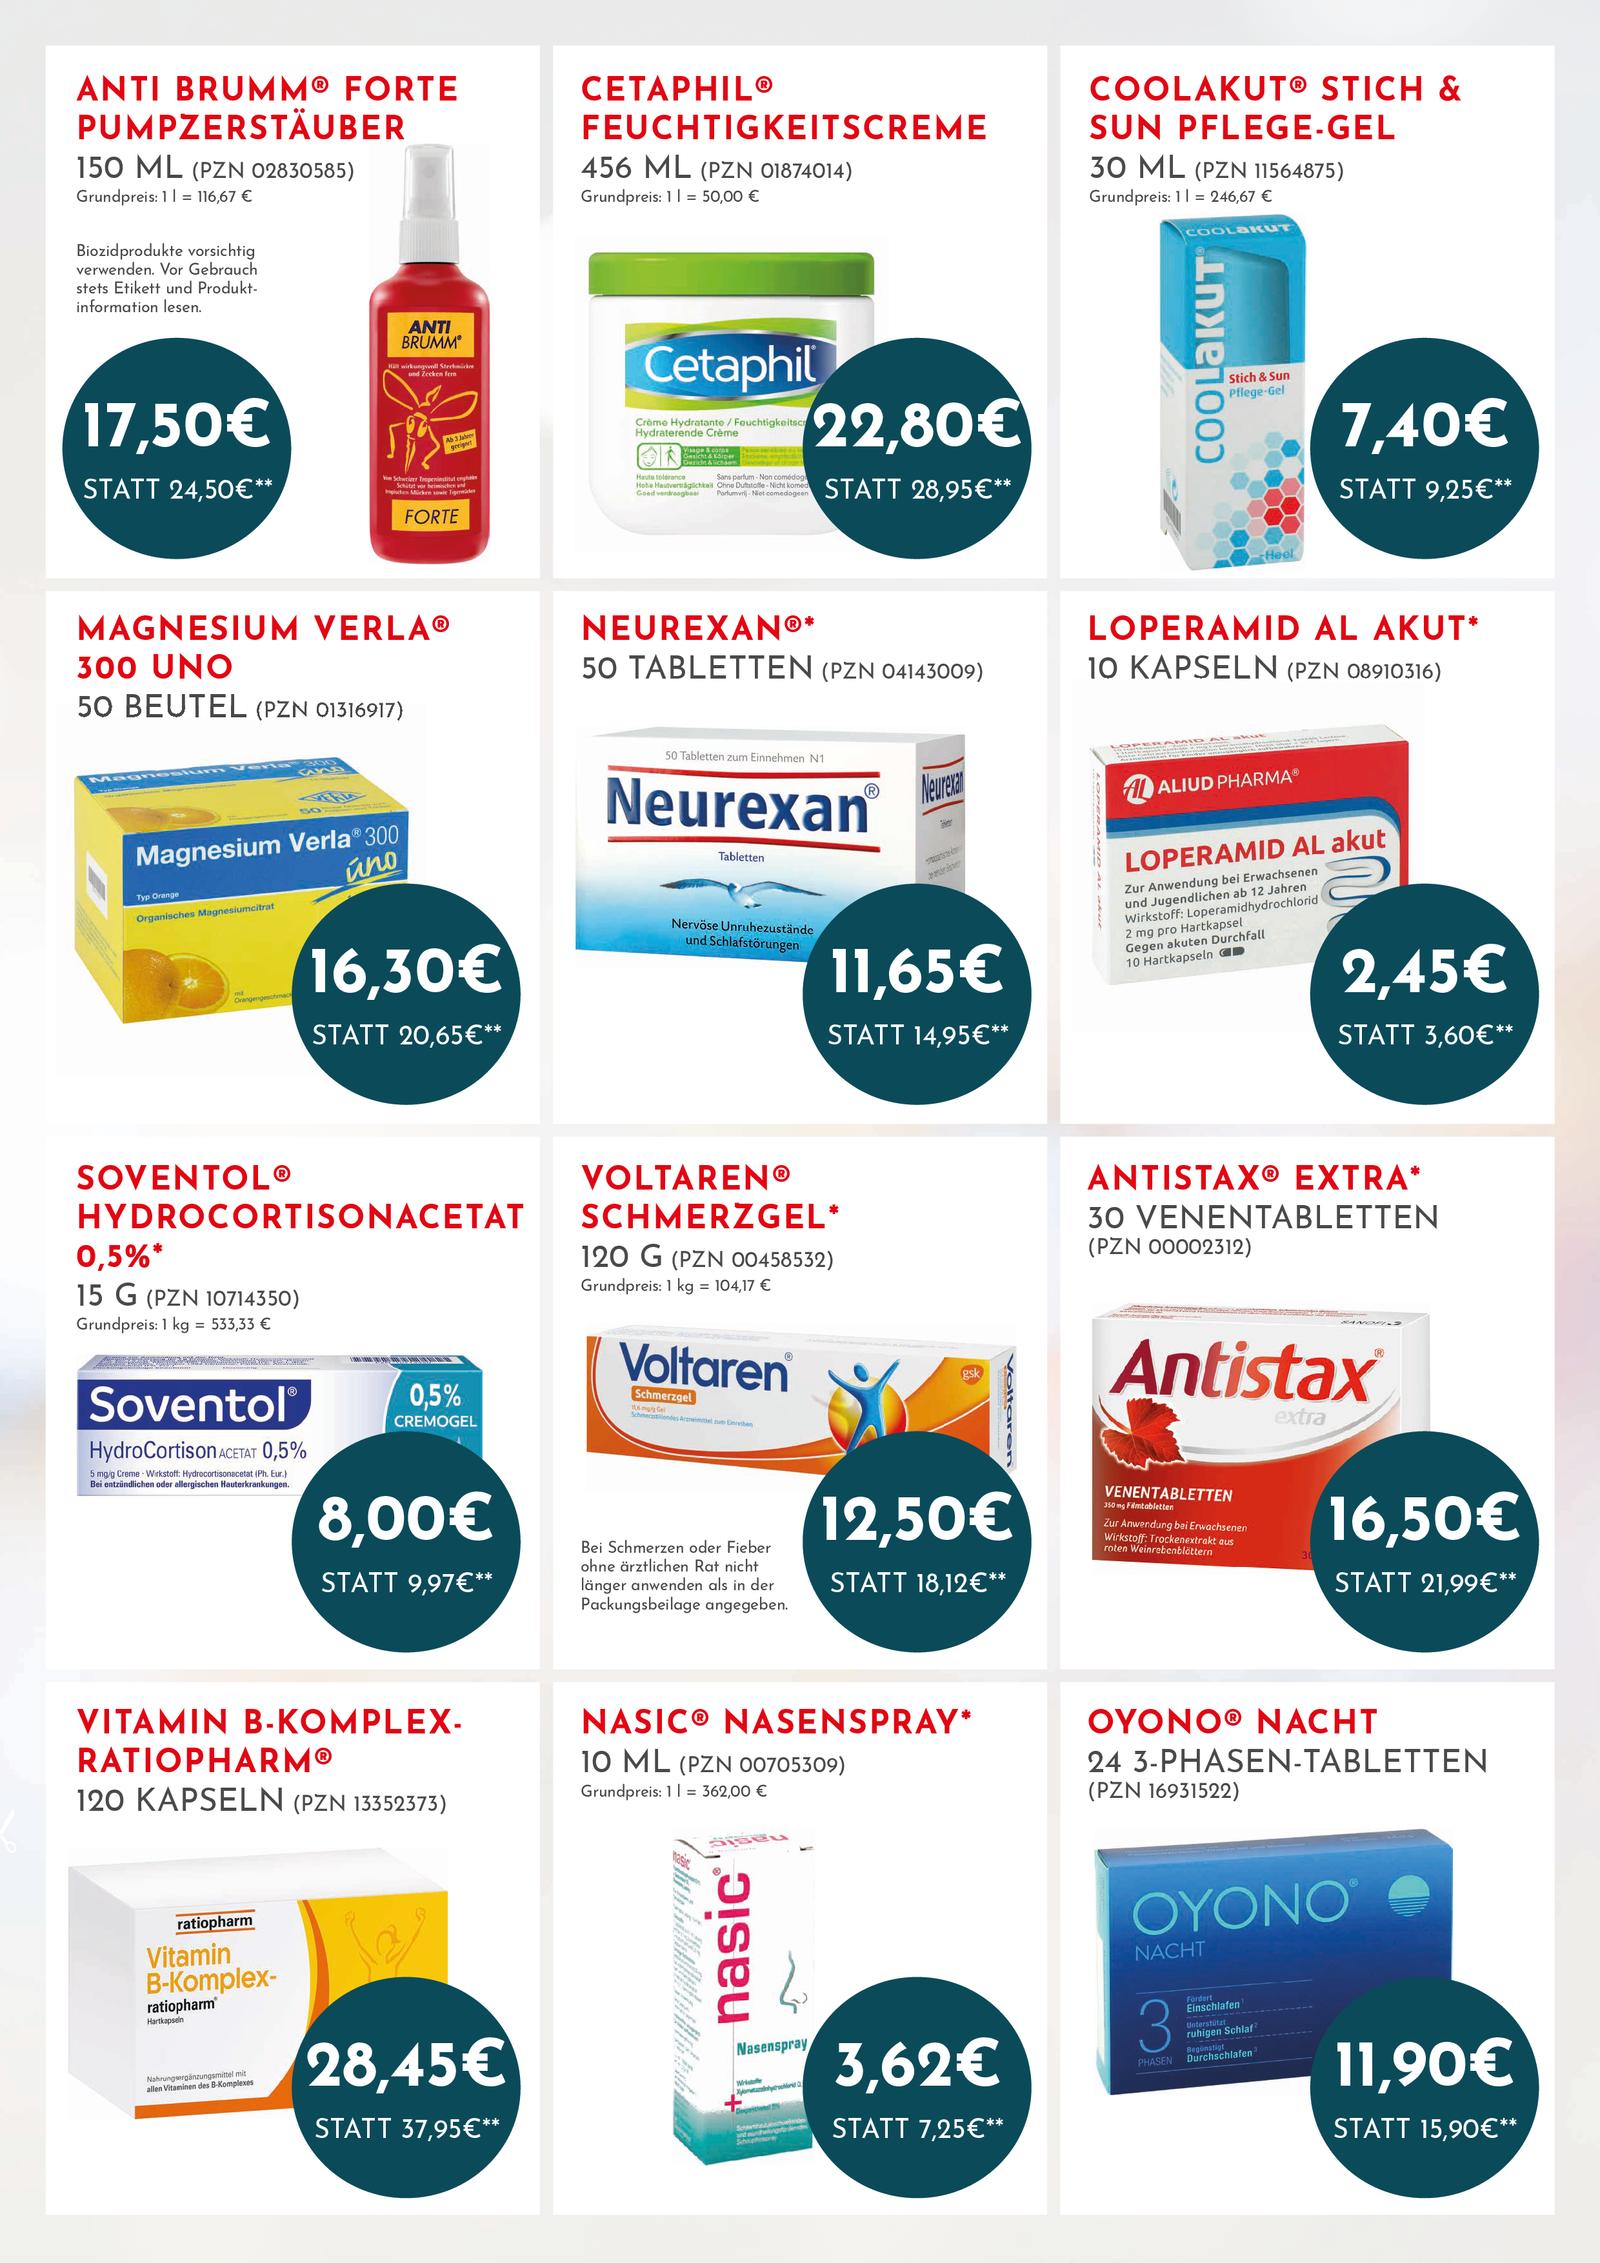 https://mein-uploads.apocdn.net/14439/leaflets/14439_flyer-Seite4.png